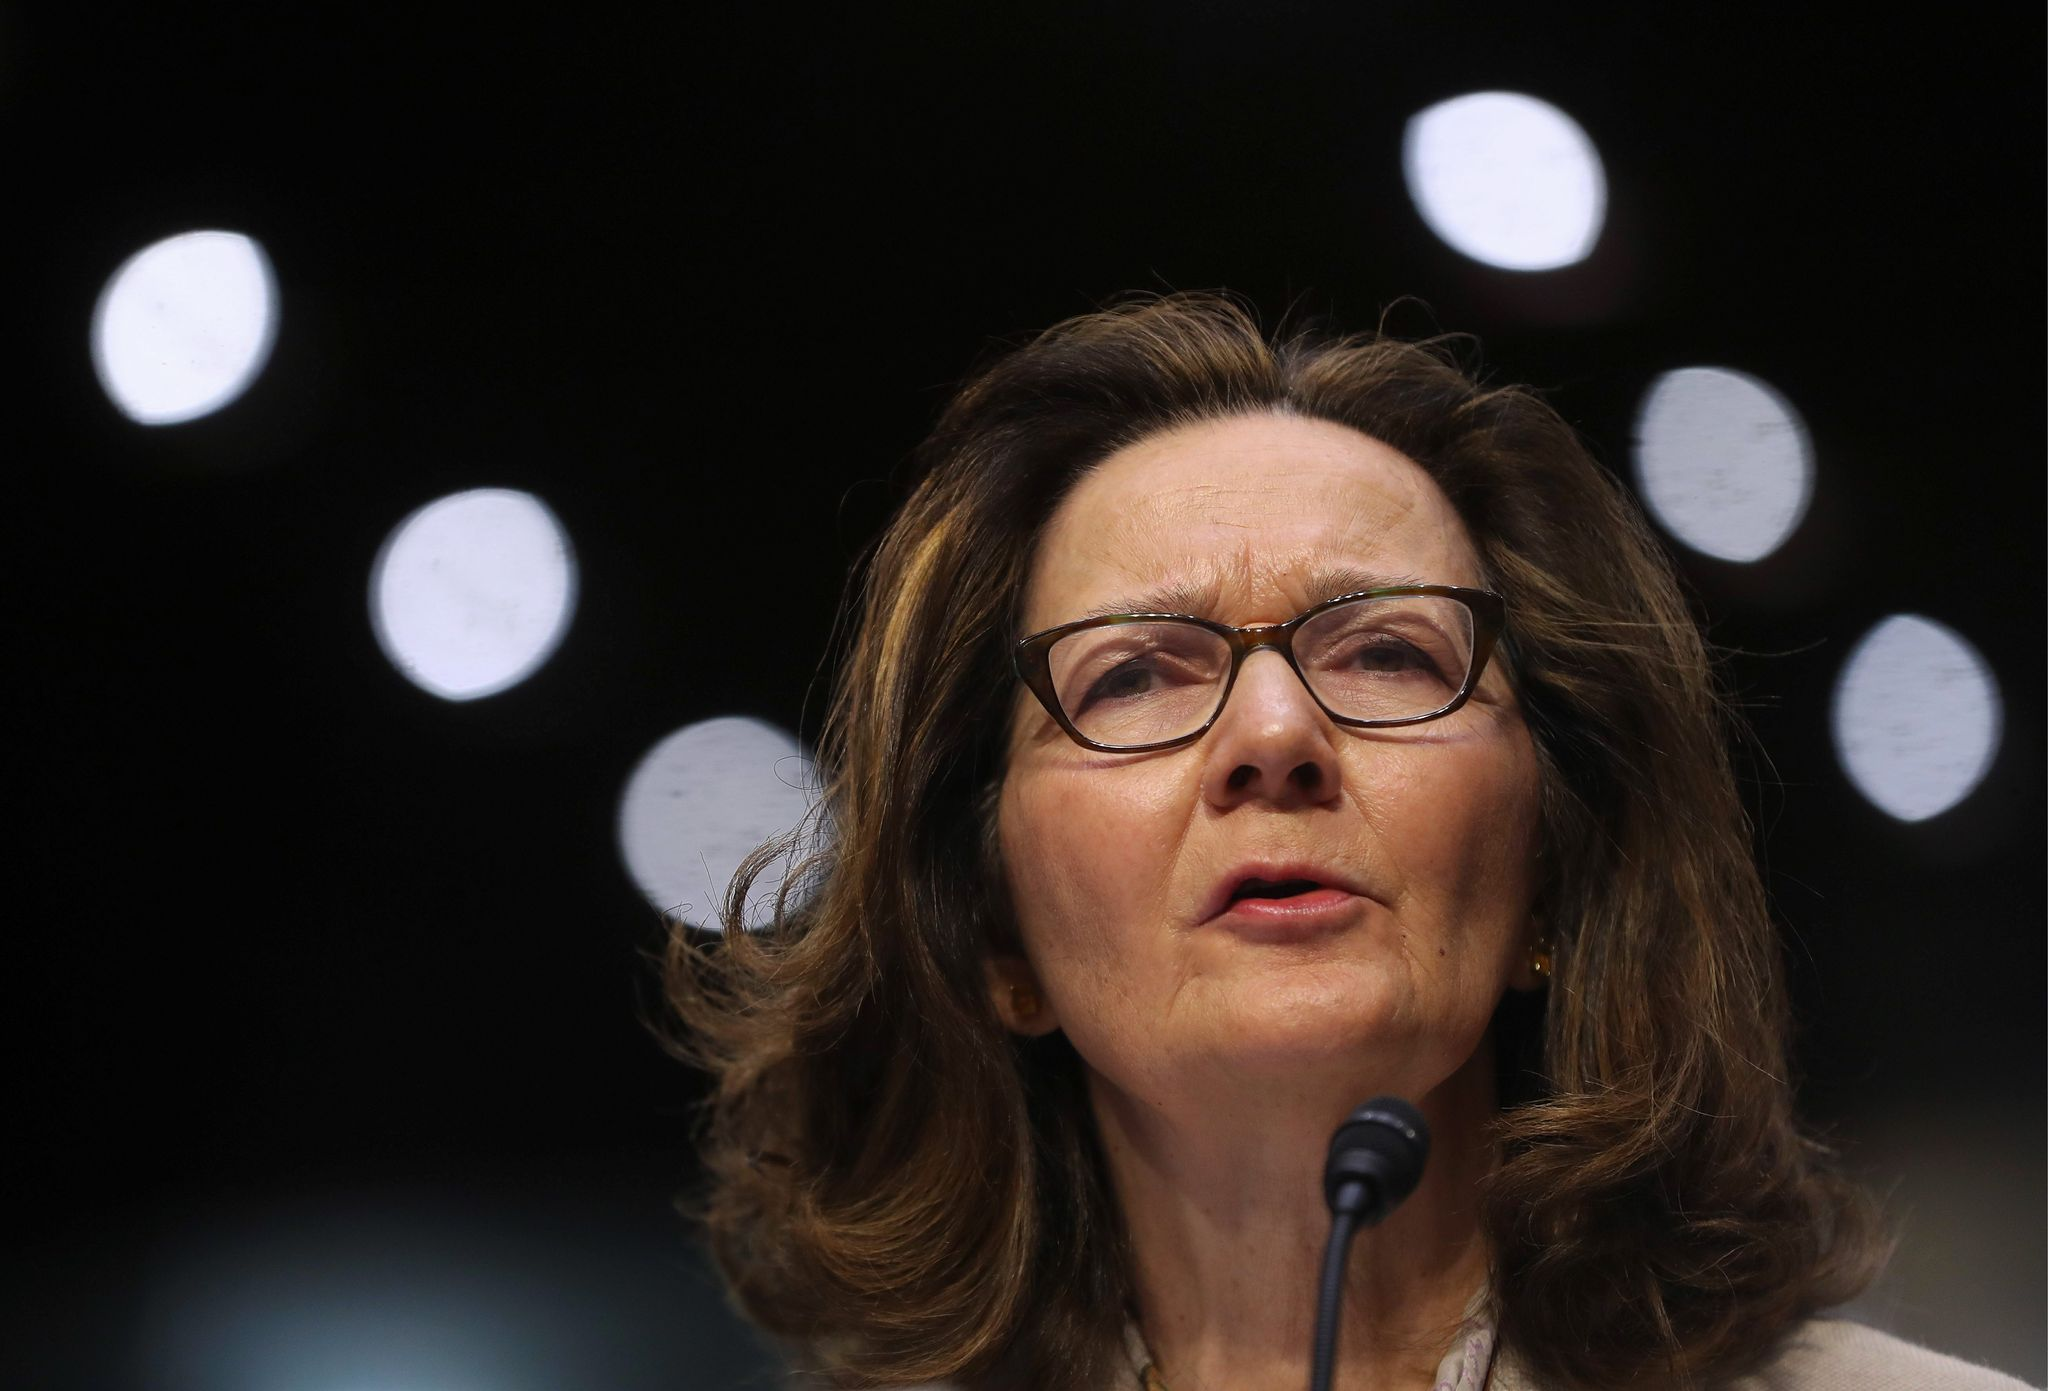 Gina Haspel, CIA pick, easily clears intel committee